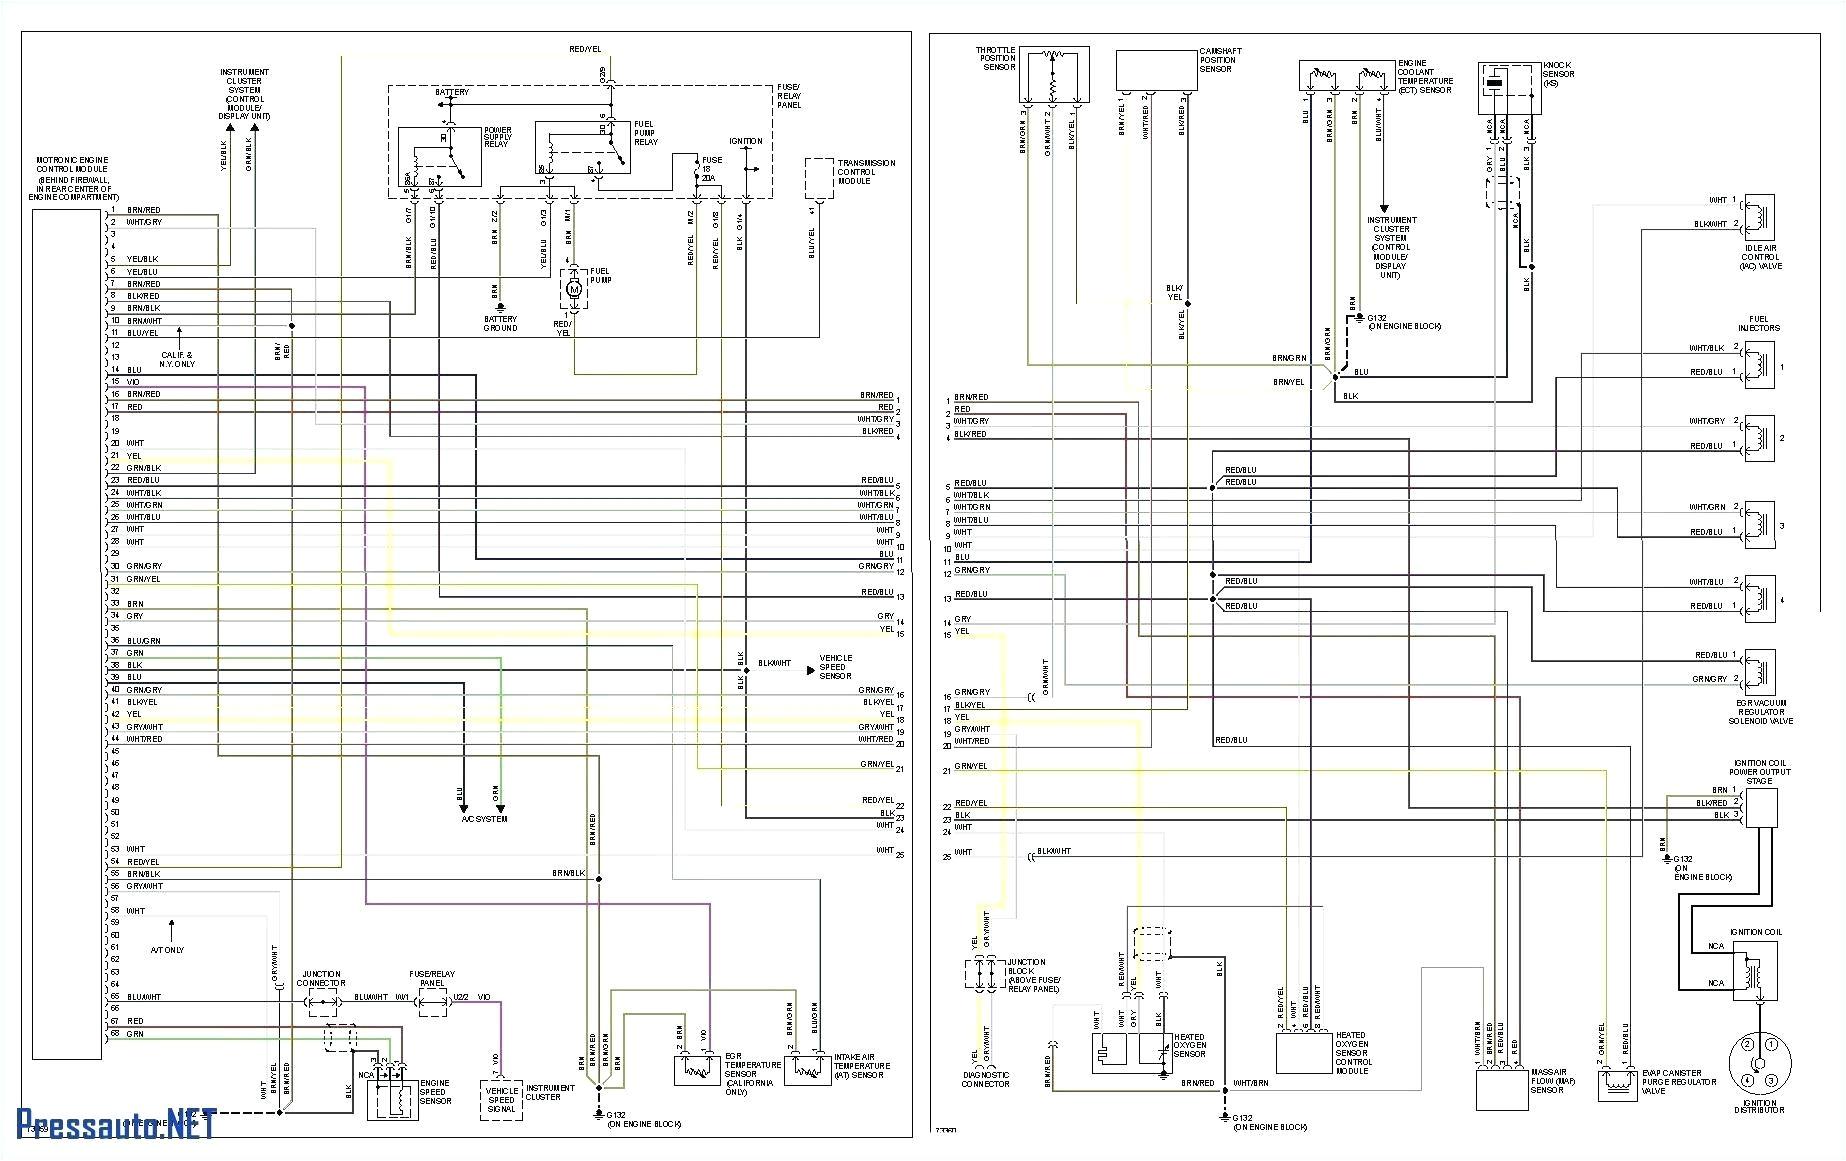 mk3 golf wiring diagram wiring diagram expert mk3 golf alternator wiring diagram mk3 golf wiring diagram